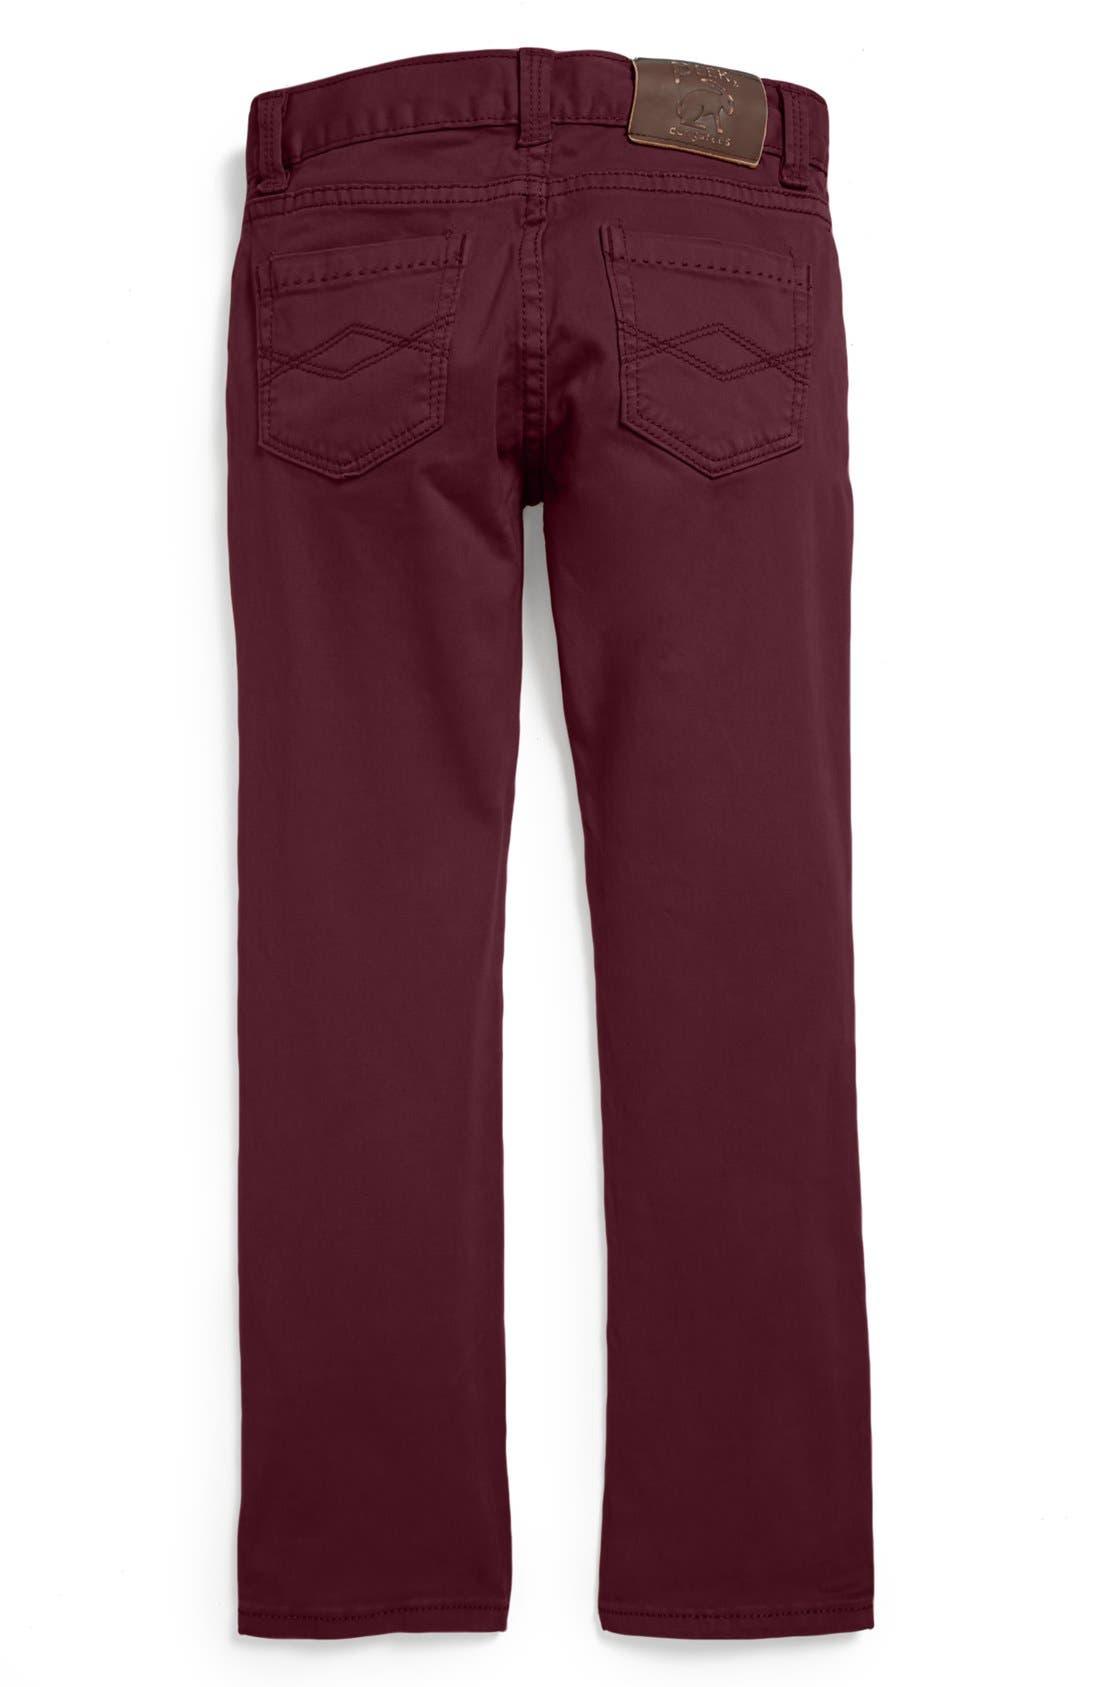 Alternate Image 2  - Peek 'Audrey' Jeans (Toddler Girls, Little Girls & Big Girls)